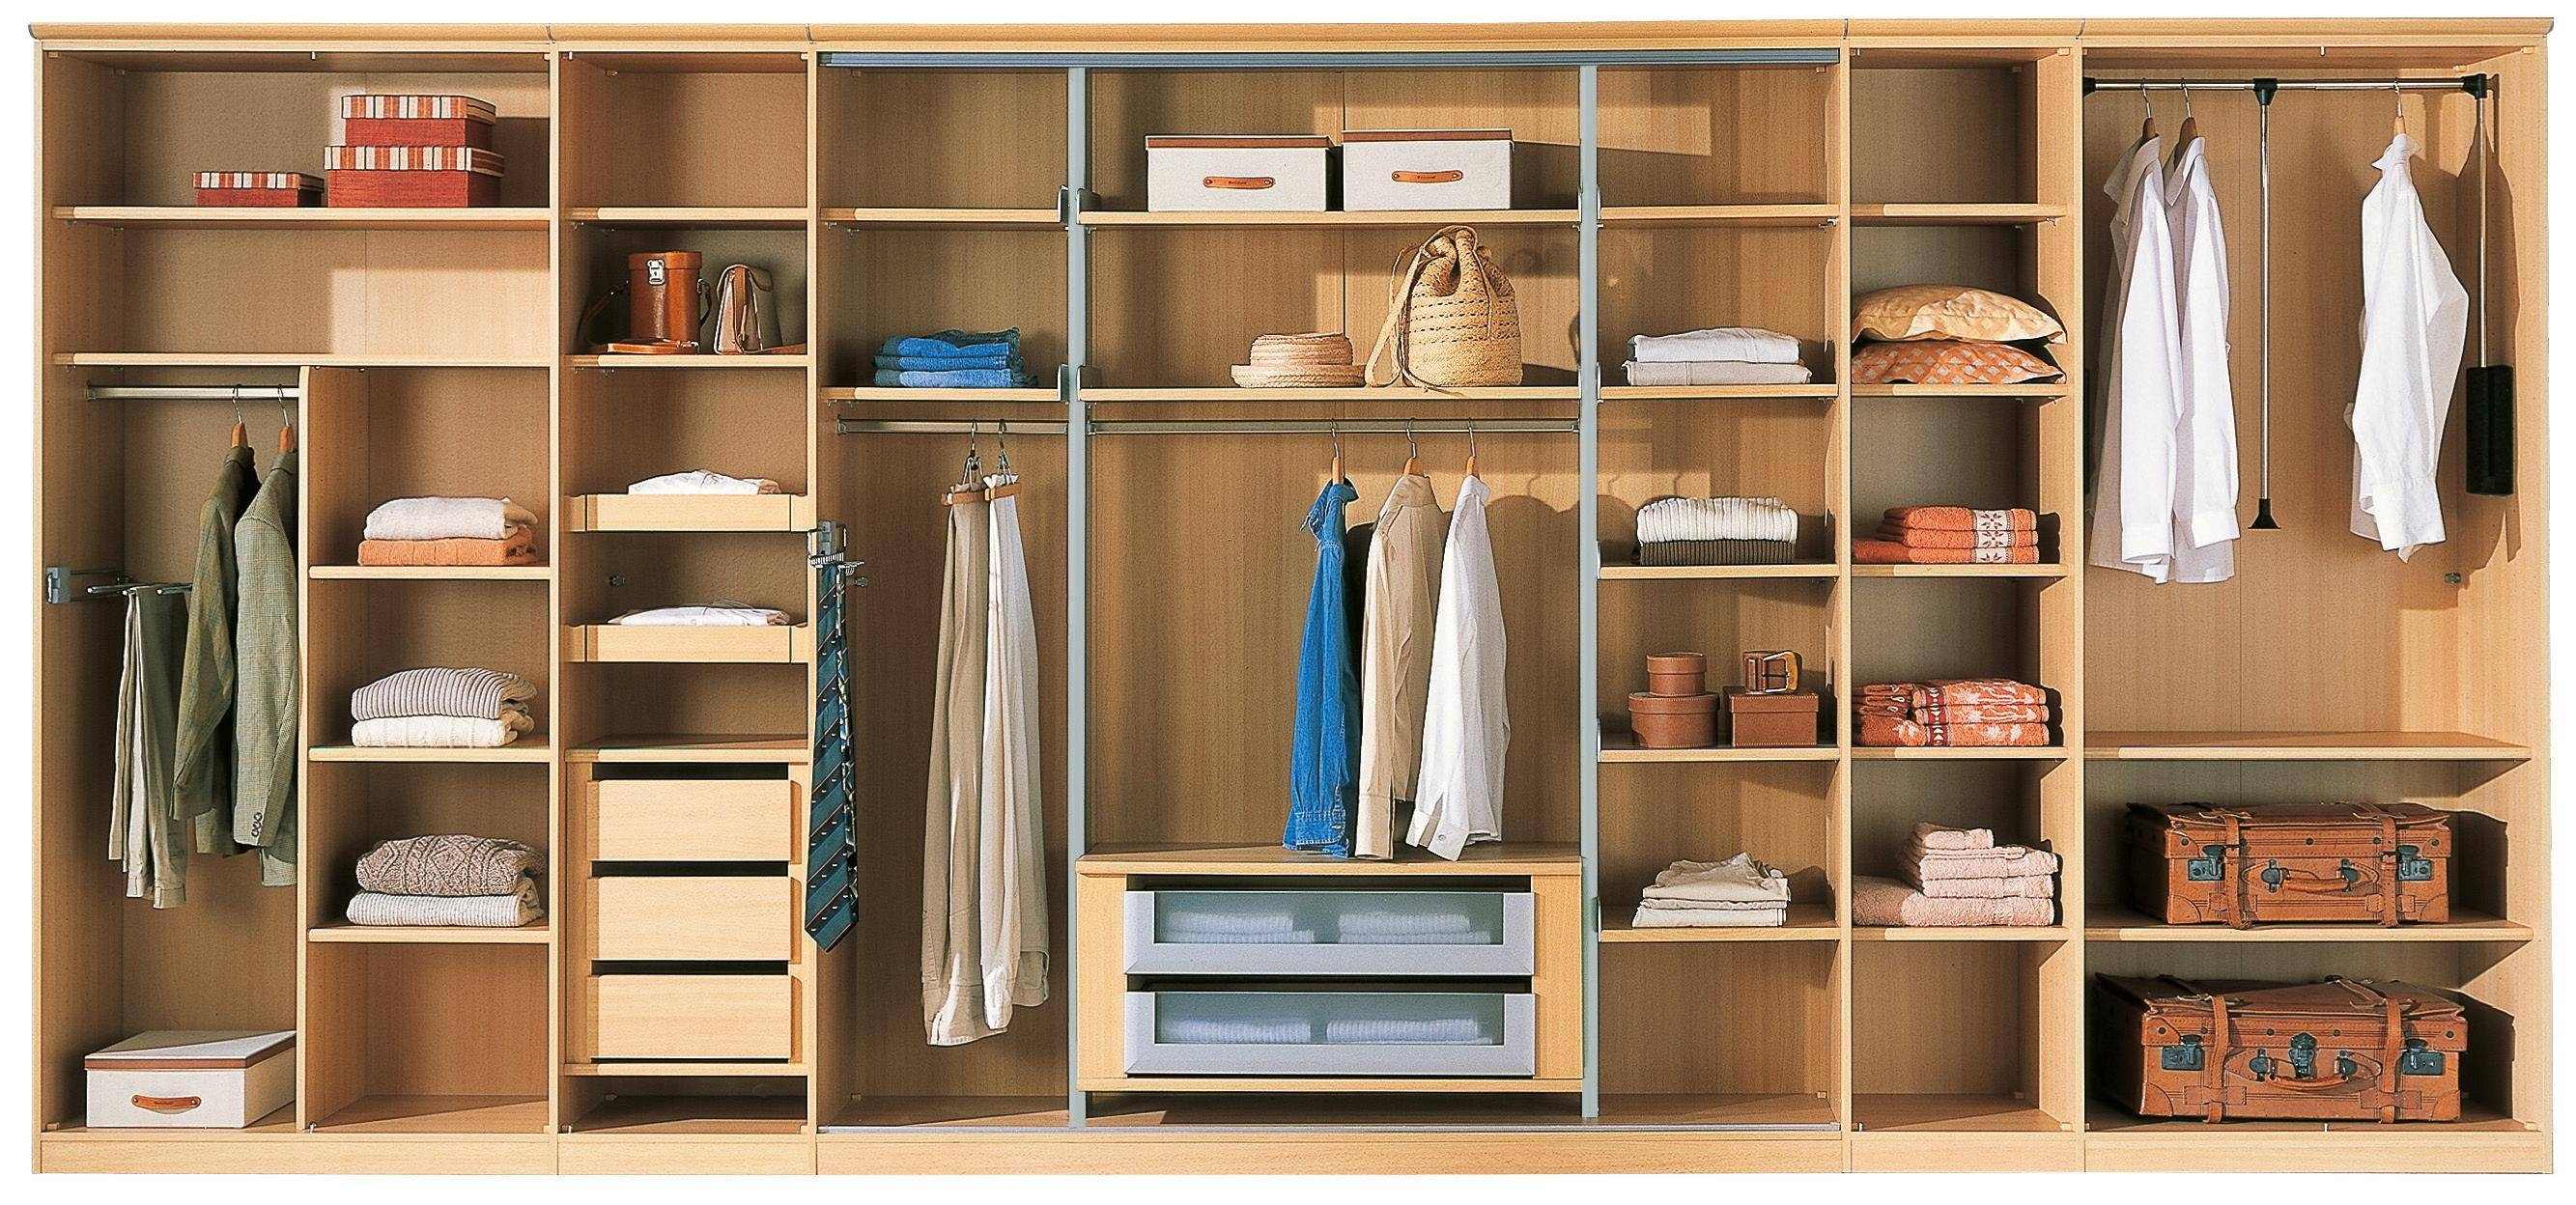 Custom Dark Brown Lacquer Teak Wood Wardrobe With Glass Door Panel In Solid Dark Wood Wardrobes (View 7 of 30)